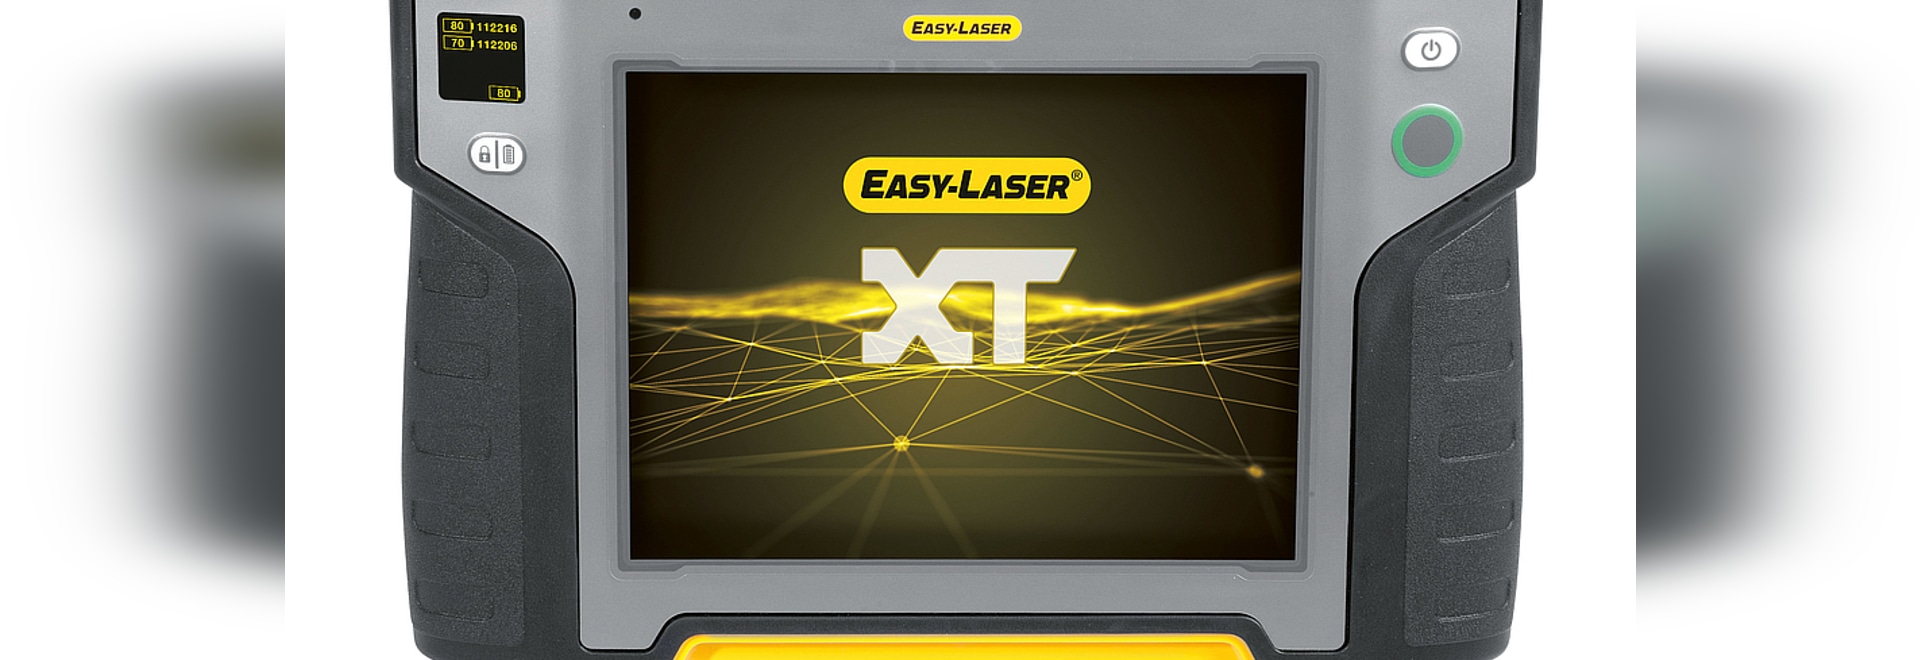 Easy-Laser XT11